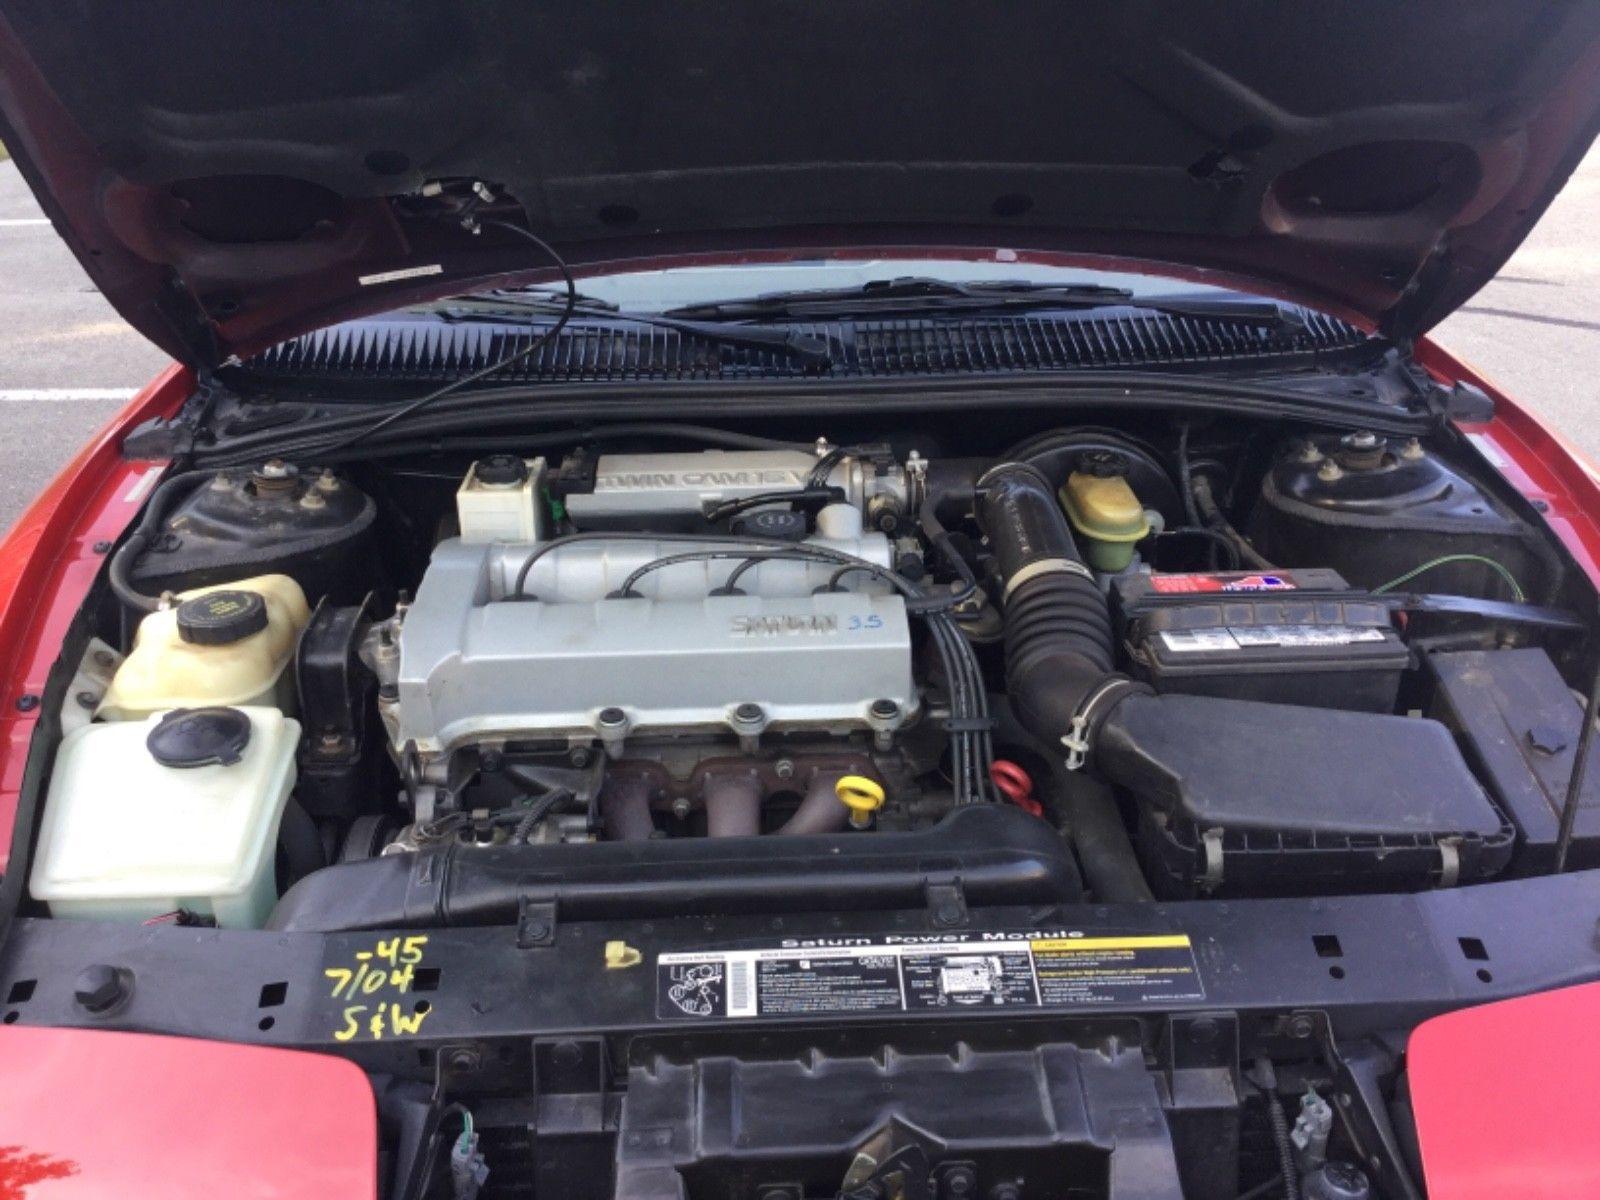 1992 Saturn SC2 engine